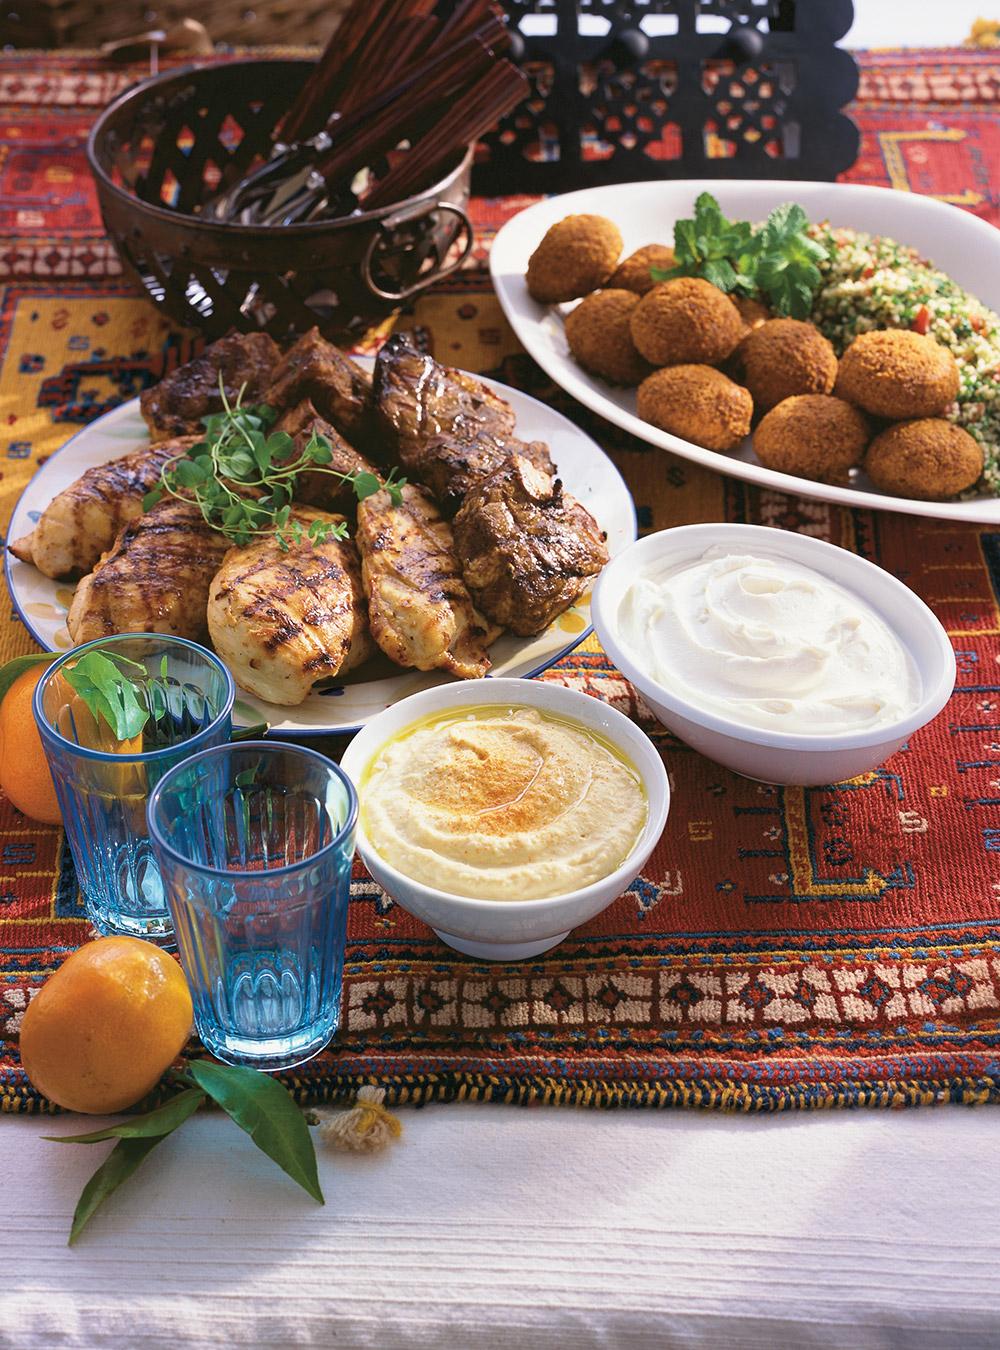 Hummus (trempette de pois chiches) | ricardo